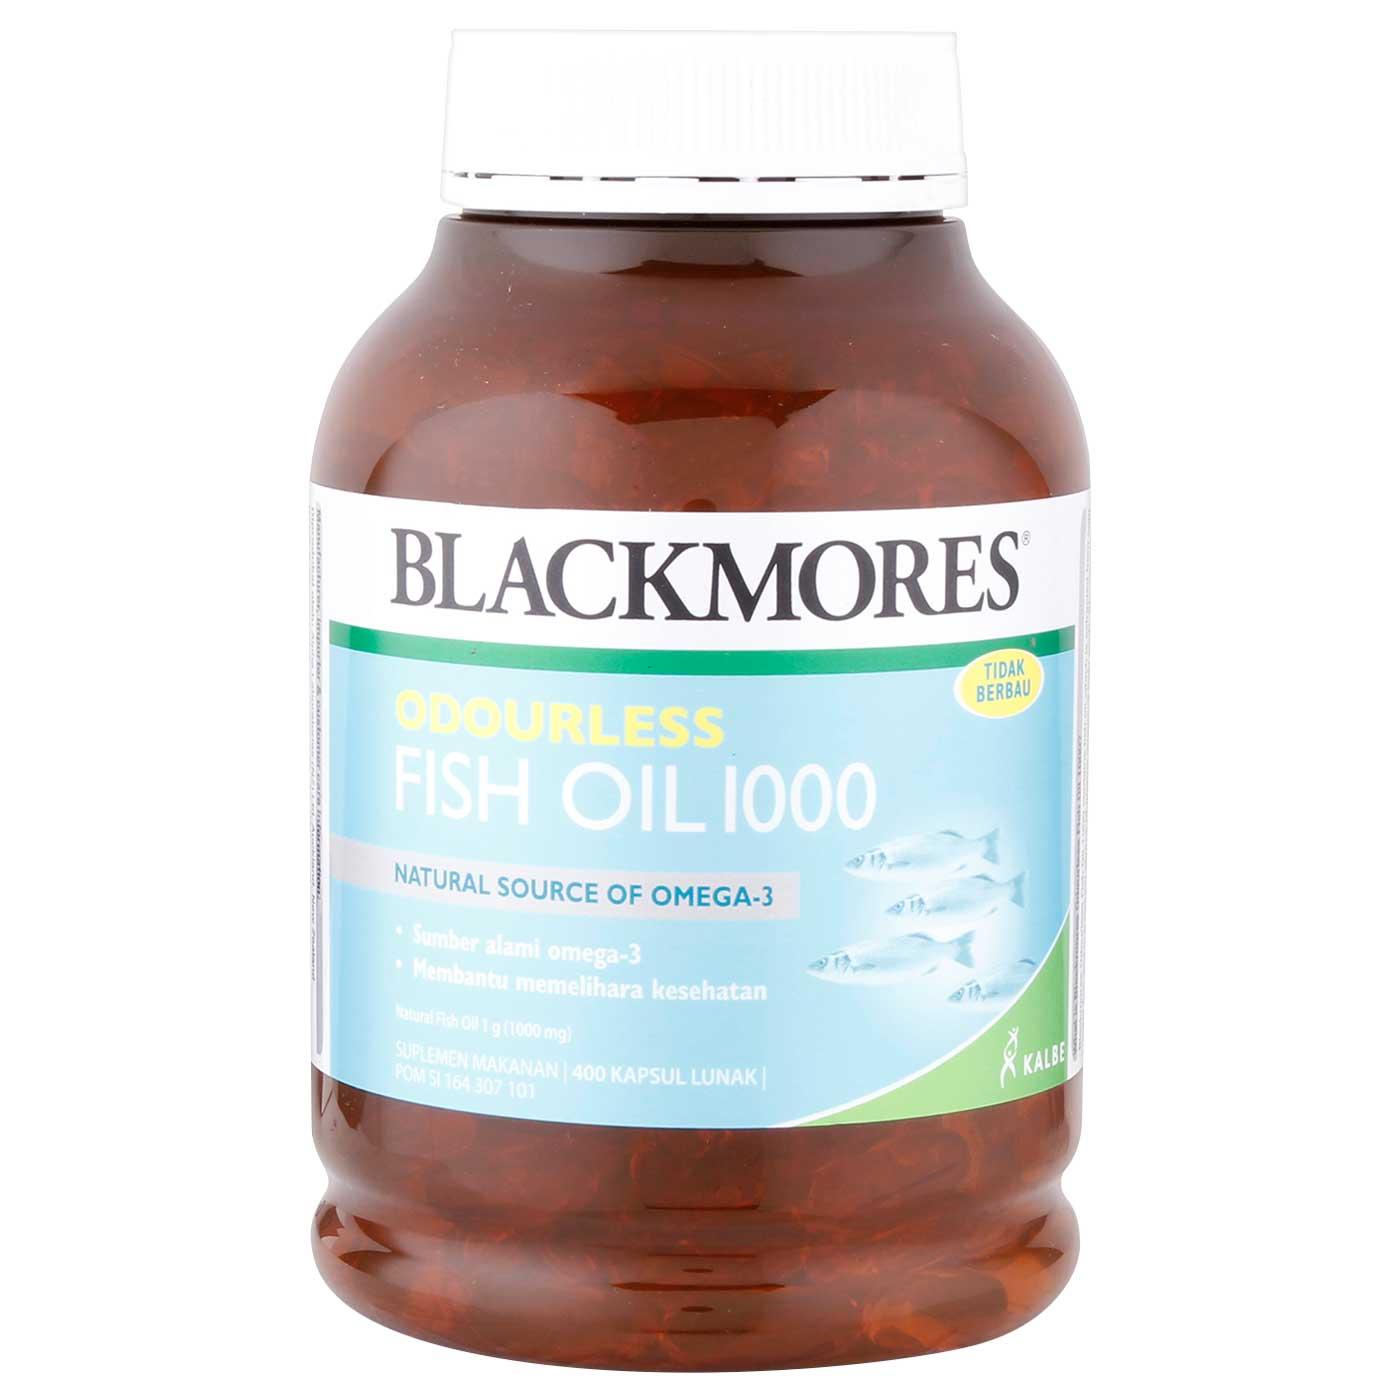 Blackmores Odourless Fish Oil 1000 400 Capsule 1